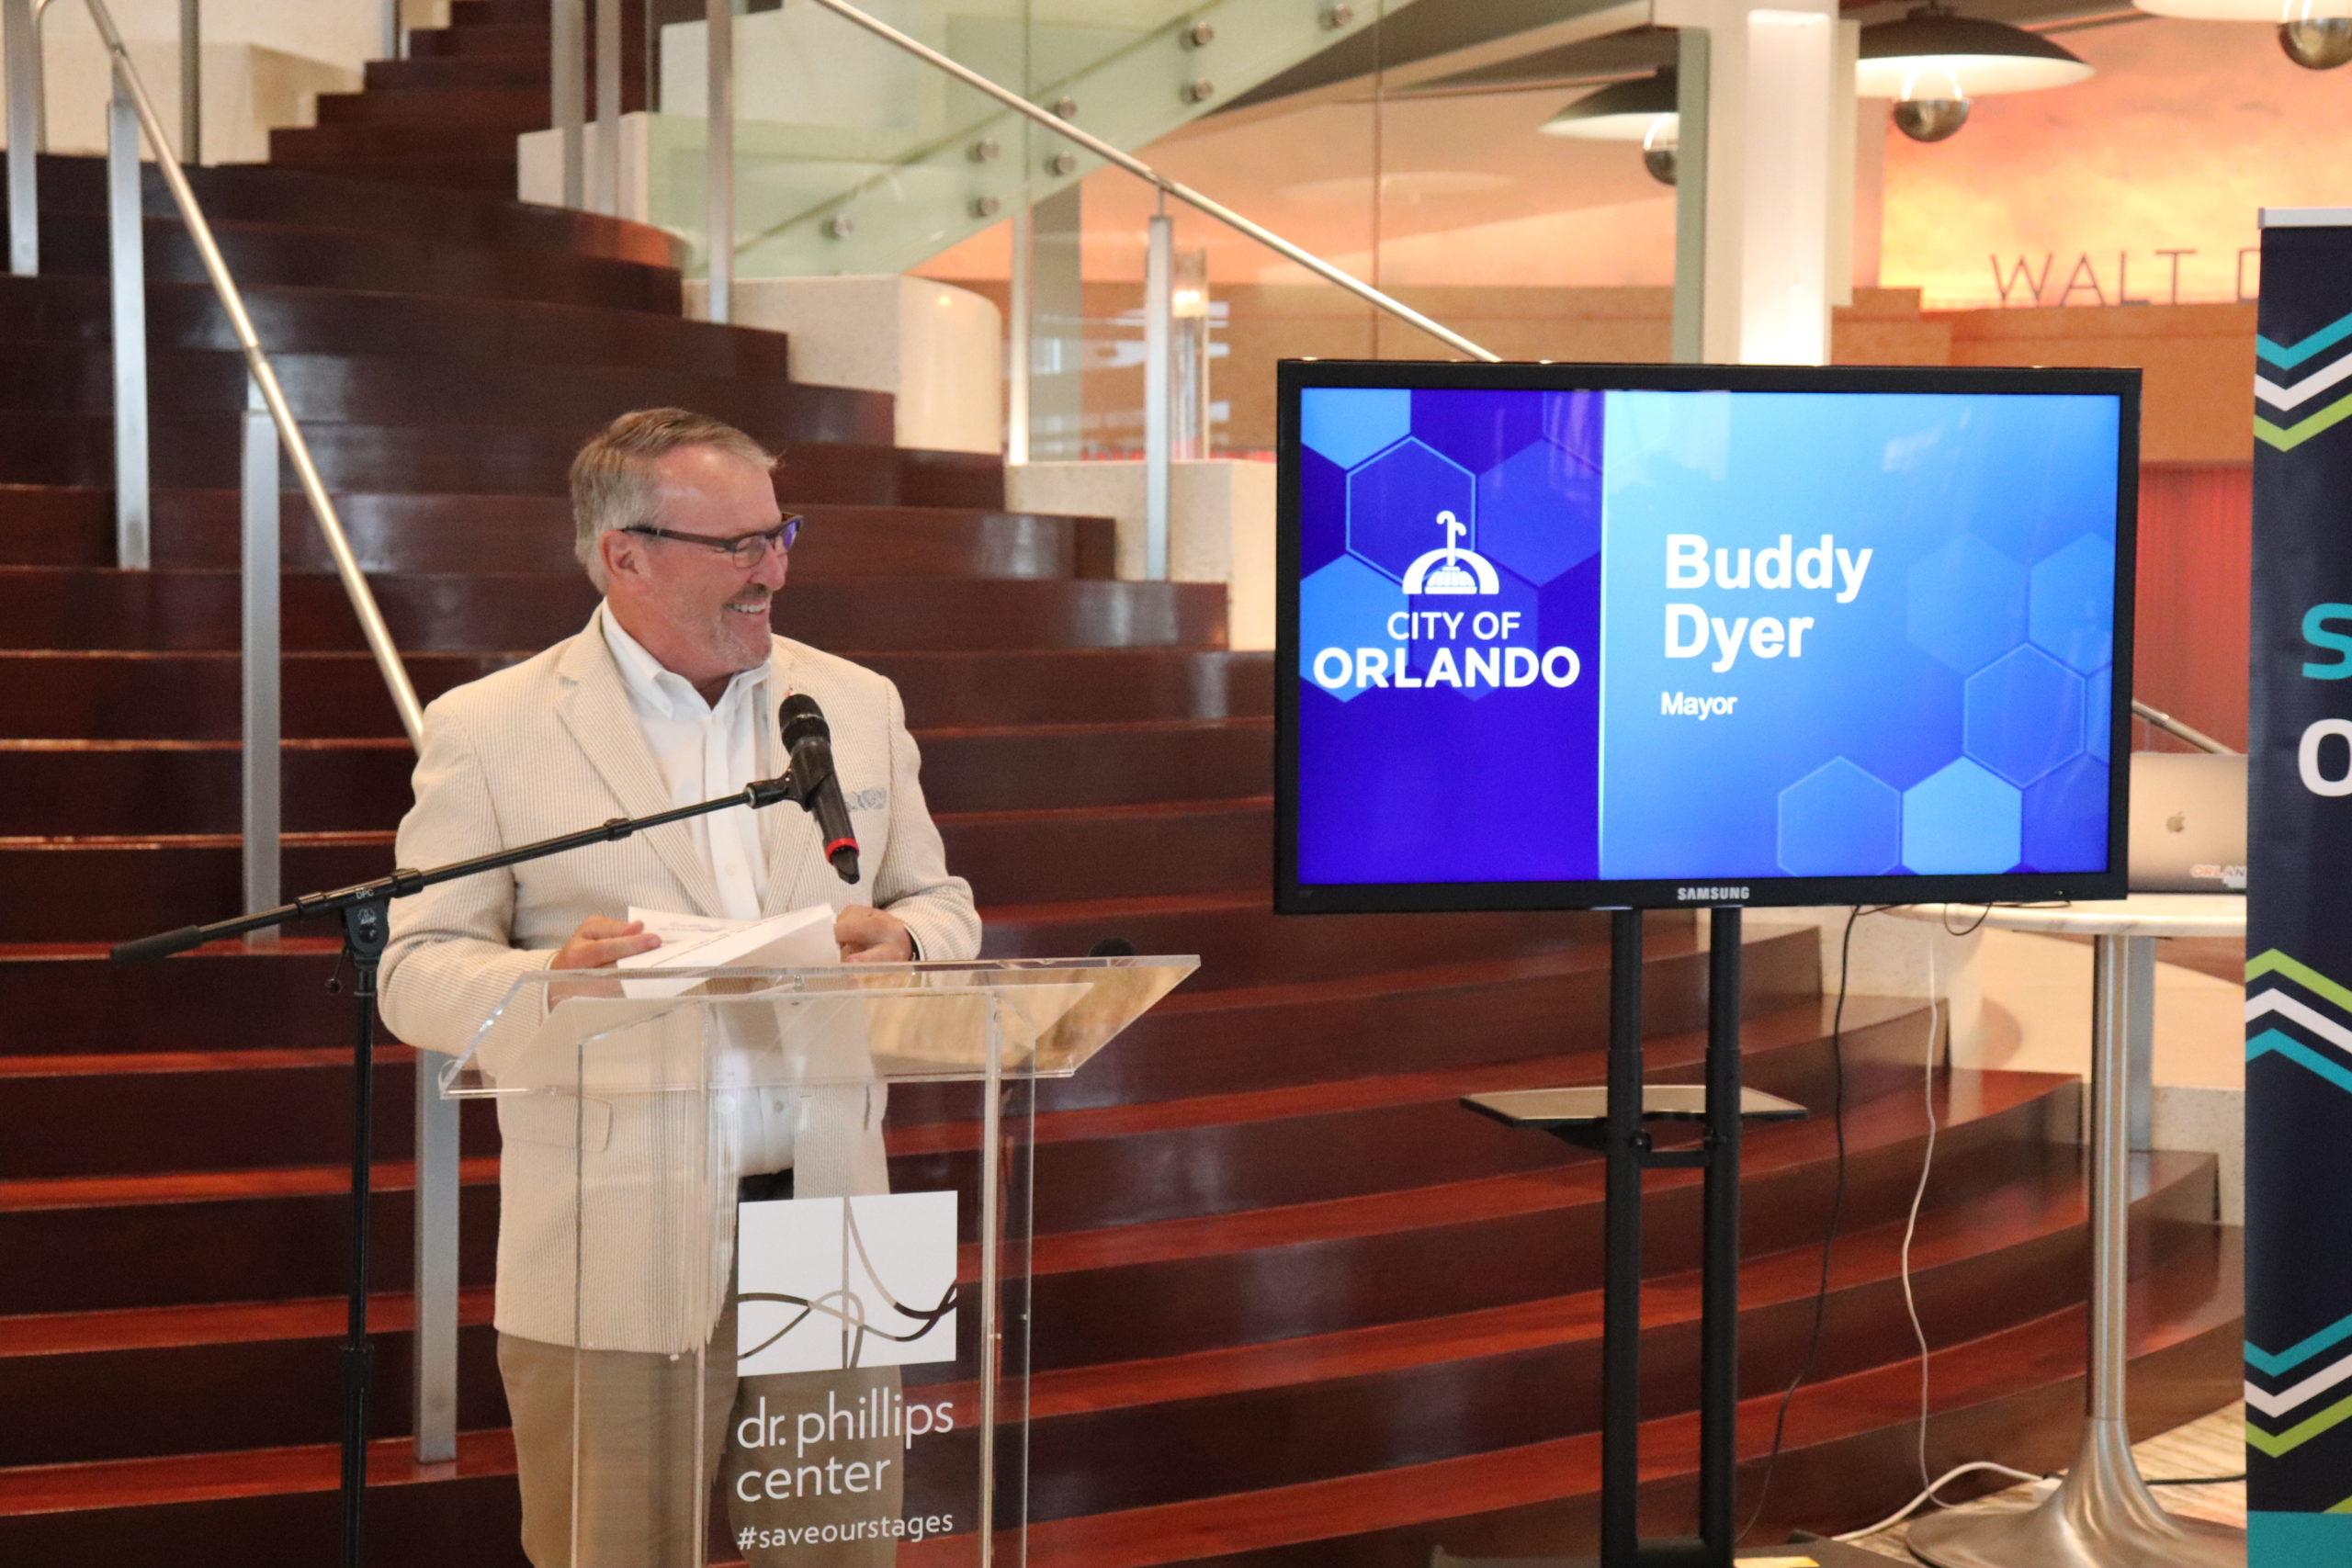 City of Orlando Mayor Buddy Dyer